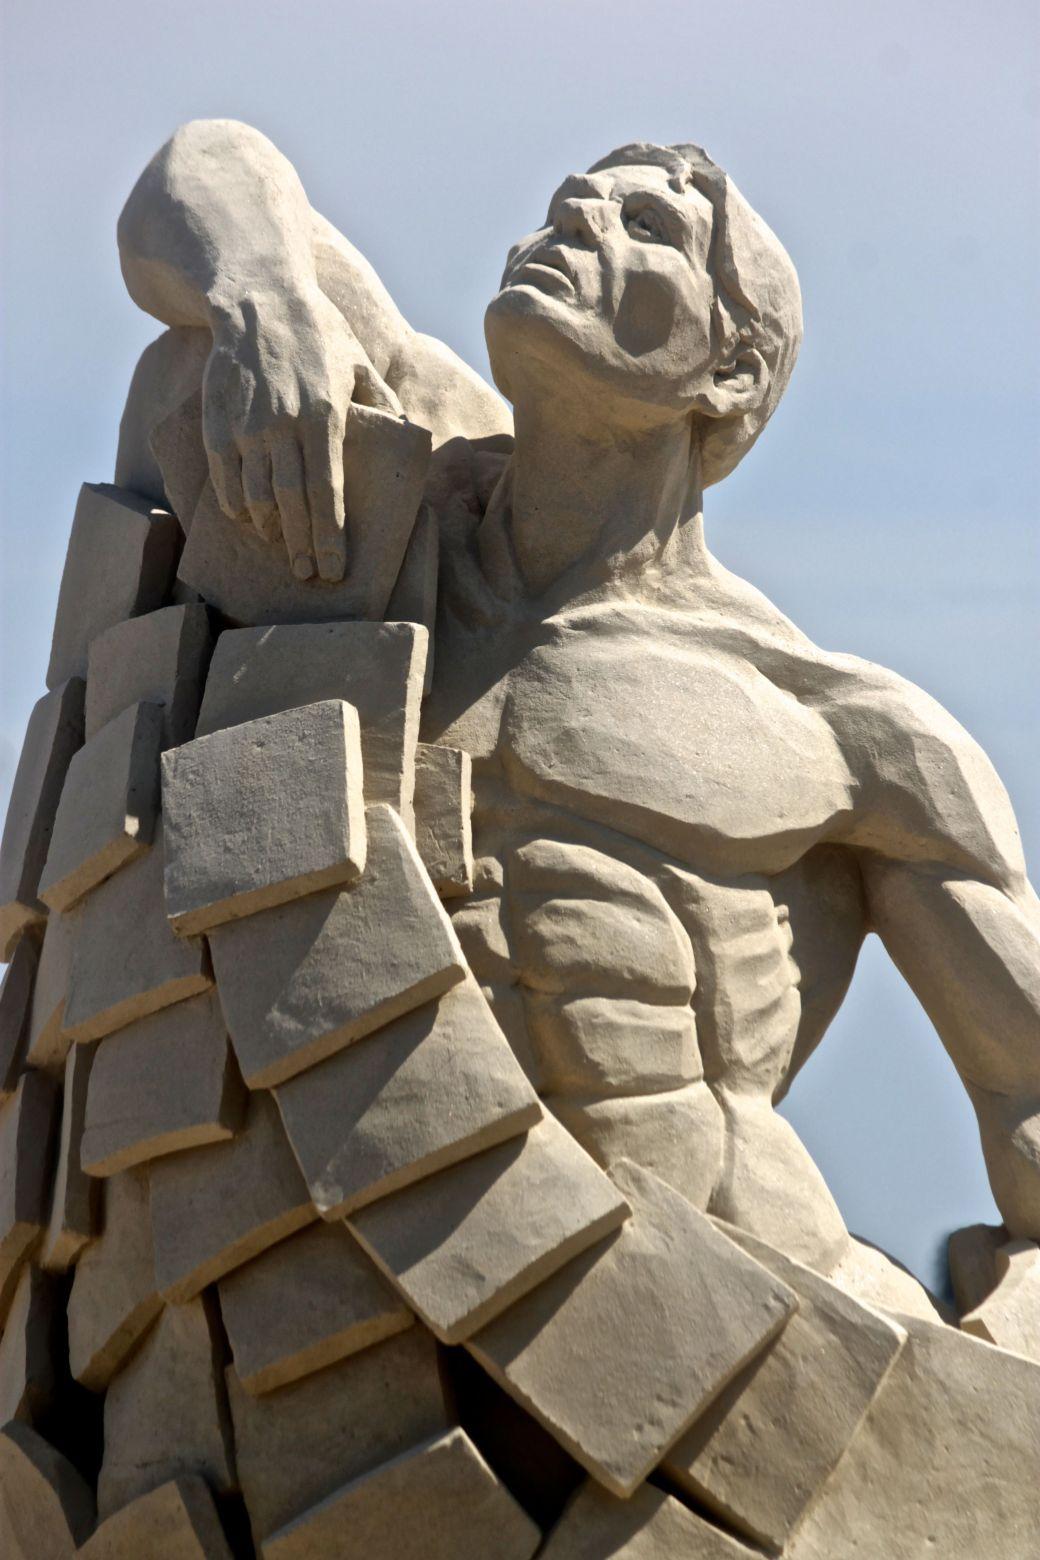 boston revere beach National Sand Sculpting Festival sculpture man looking upward